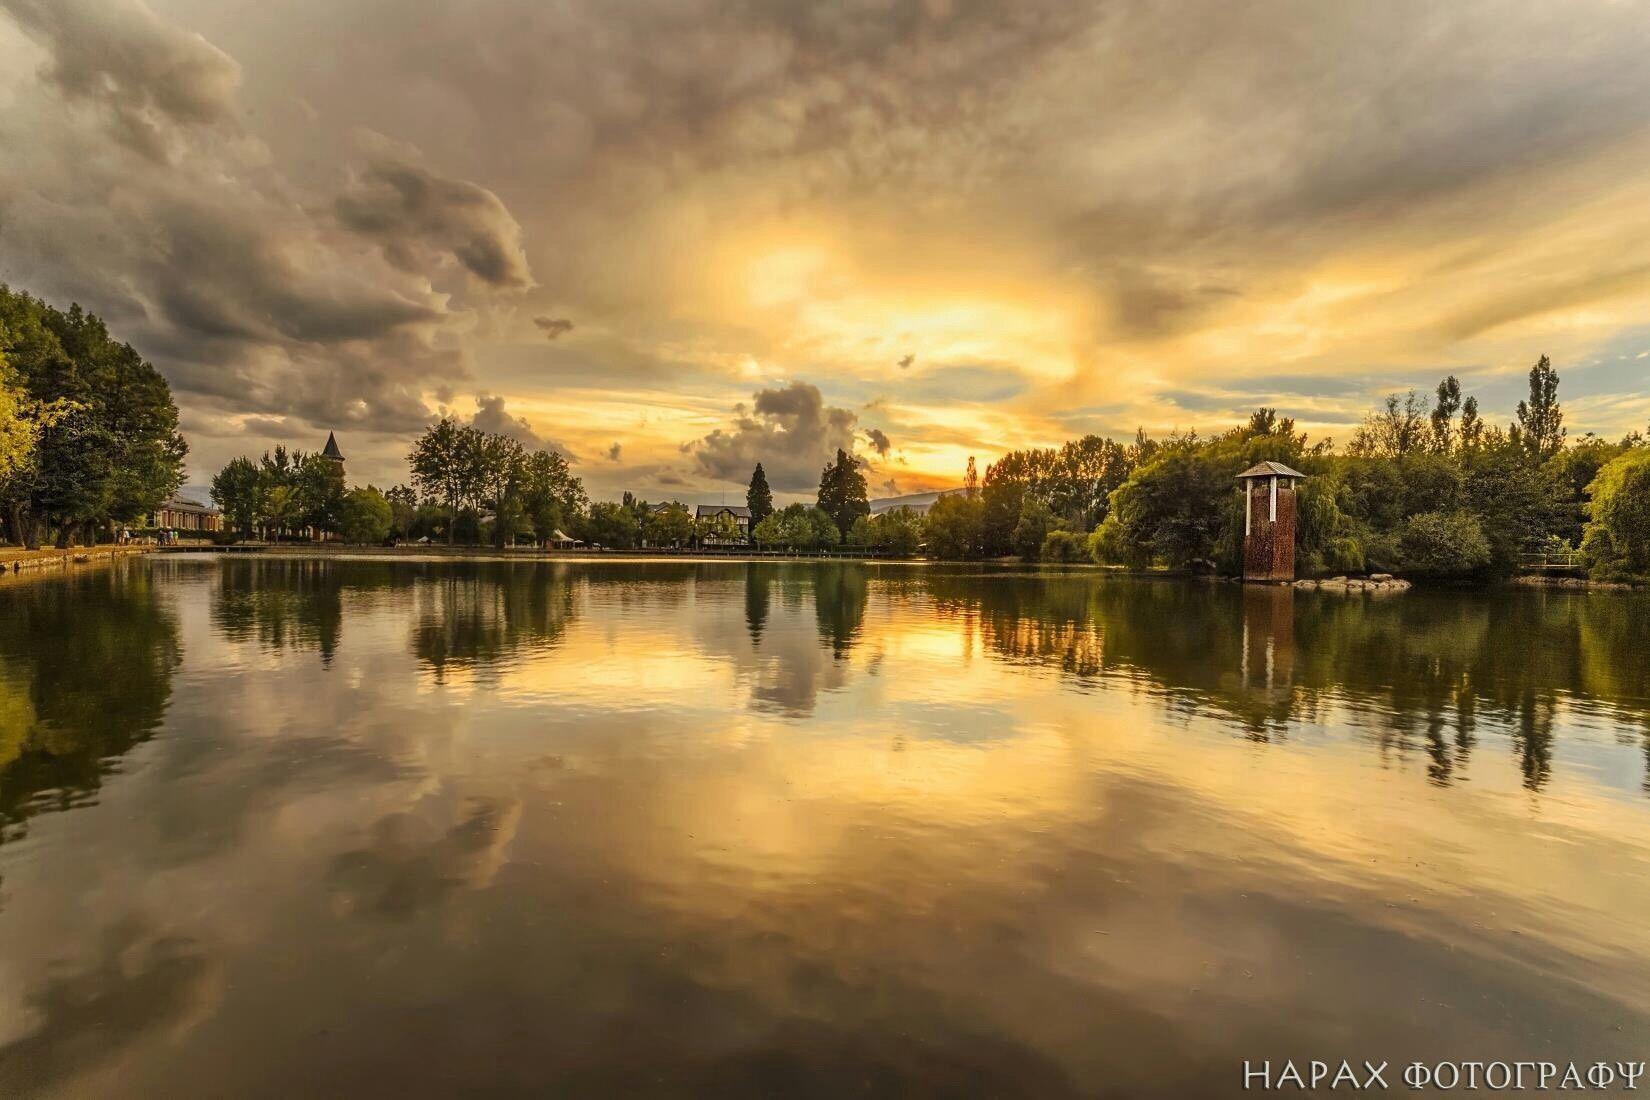 Sunset at the lake. Atardecer en el lago. Capvespre a l'Estany de Puigcerdà